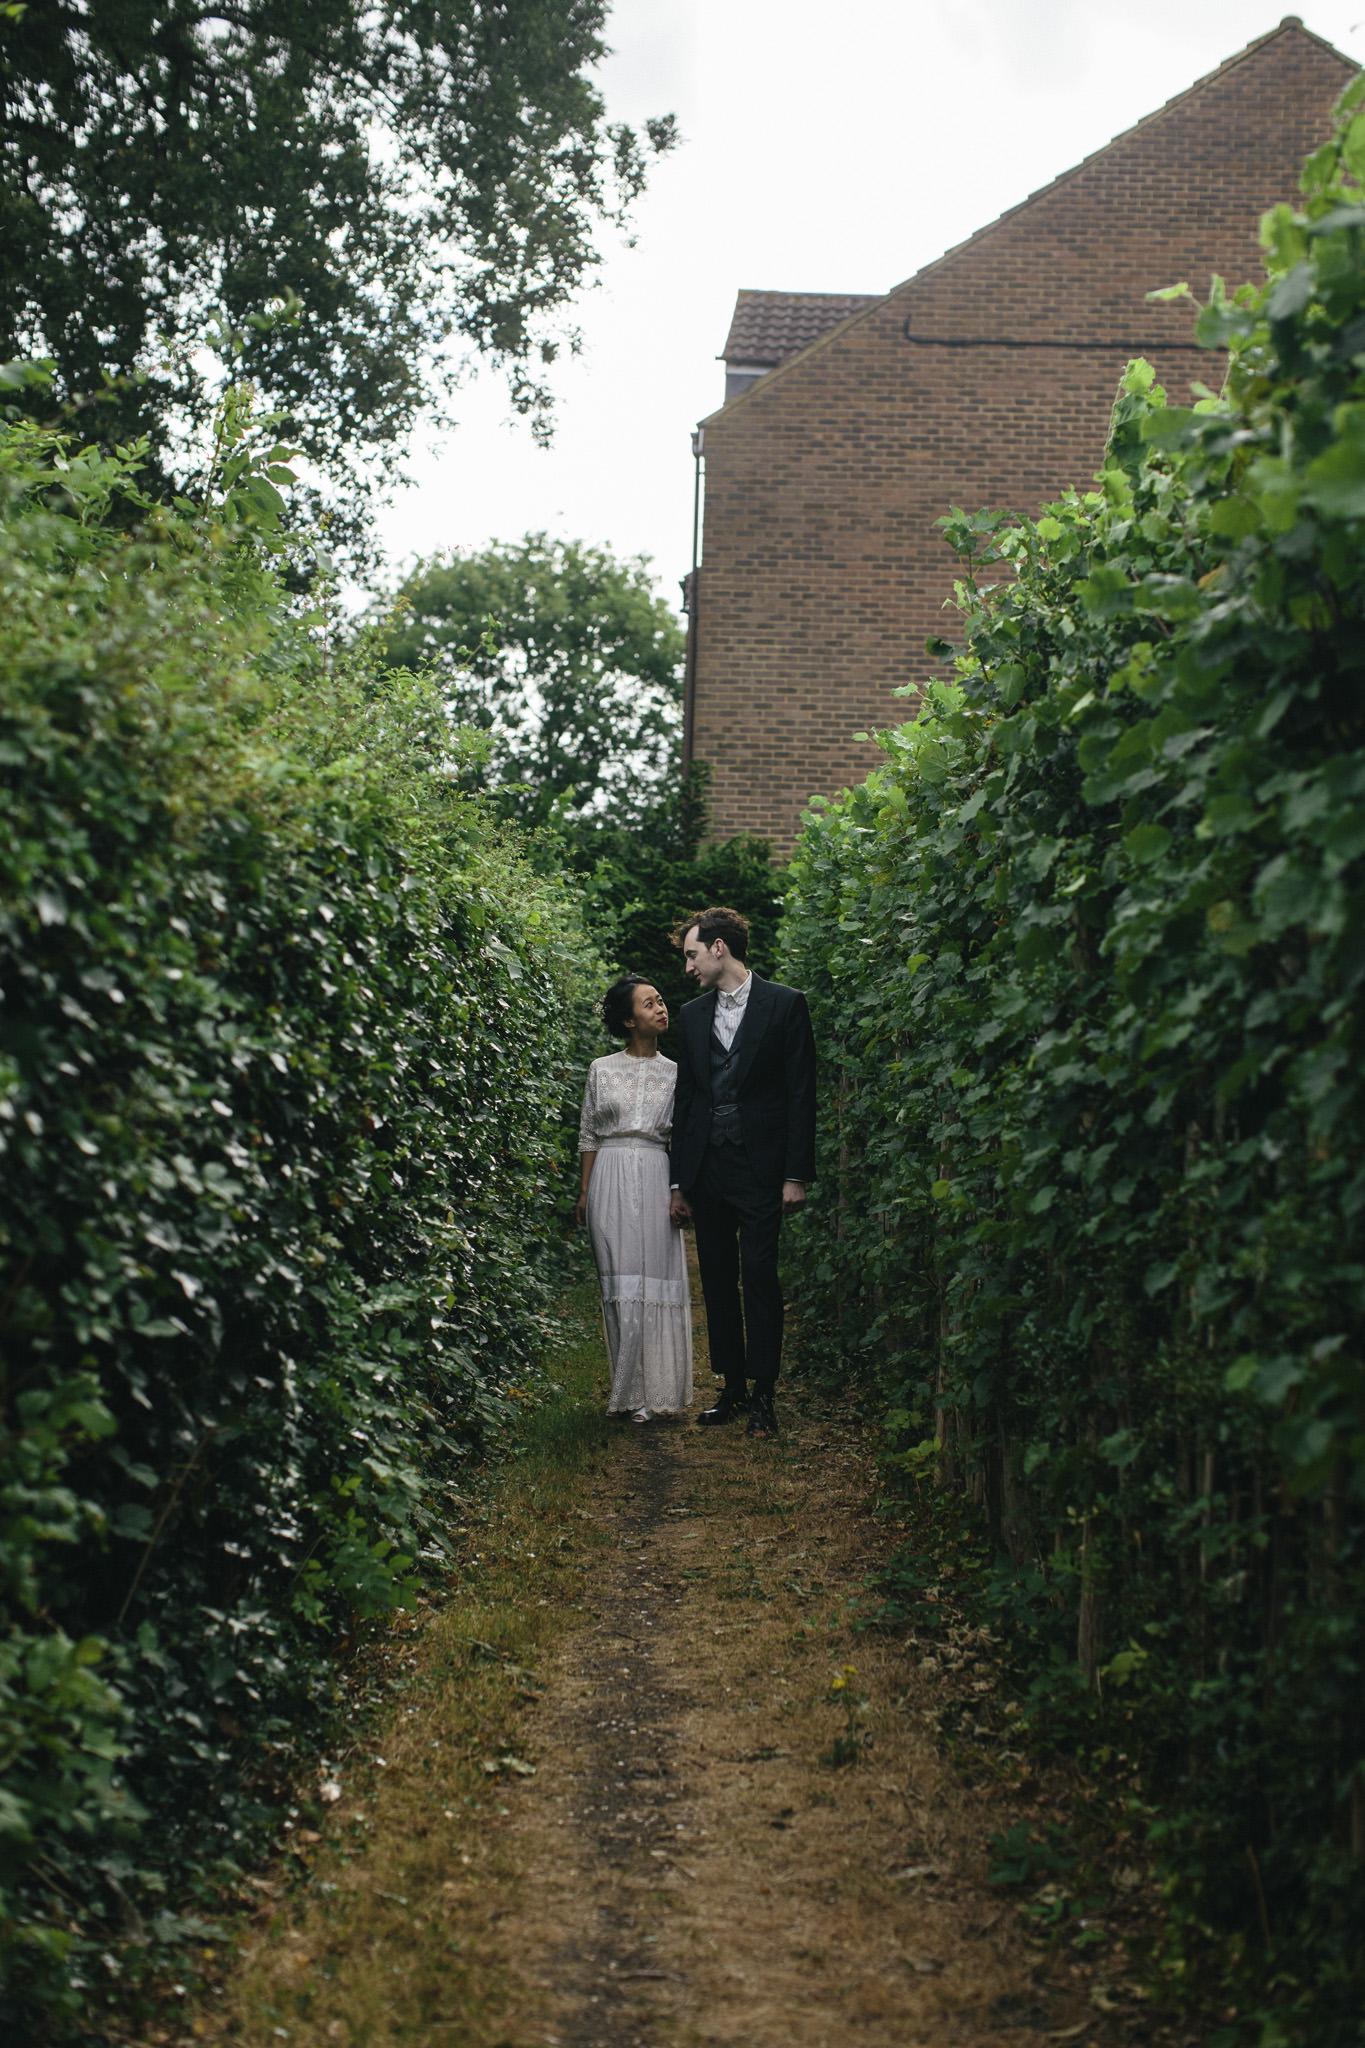 Quirky Wedding Photographer Scotland Glasgow Edinburgh Mirrorbox 084.jpg